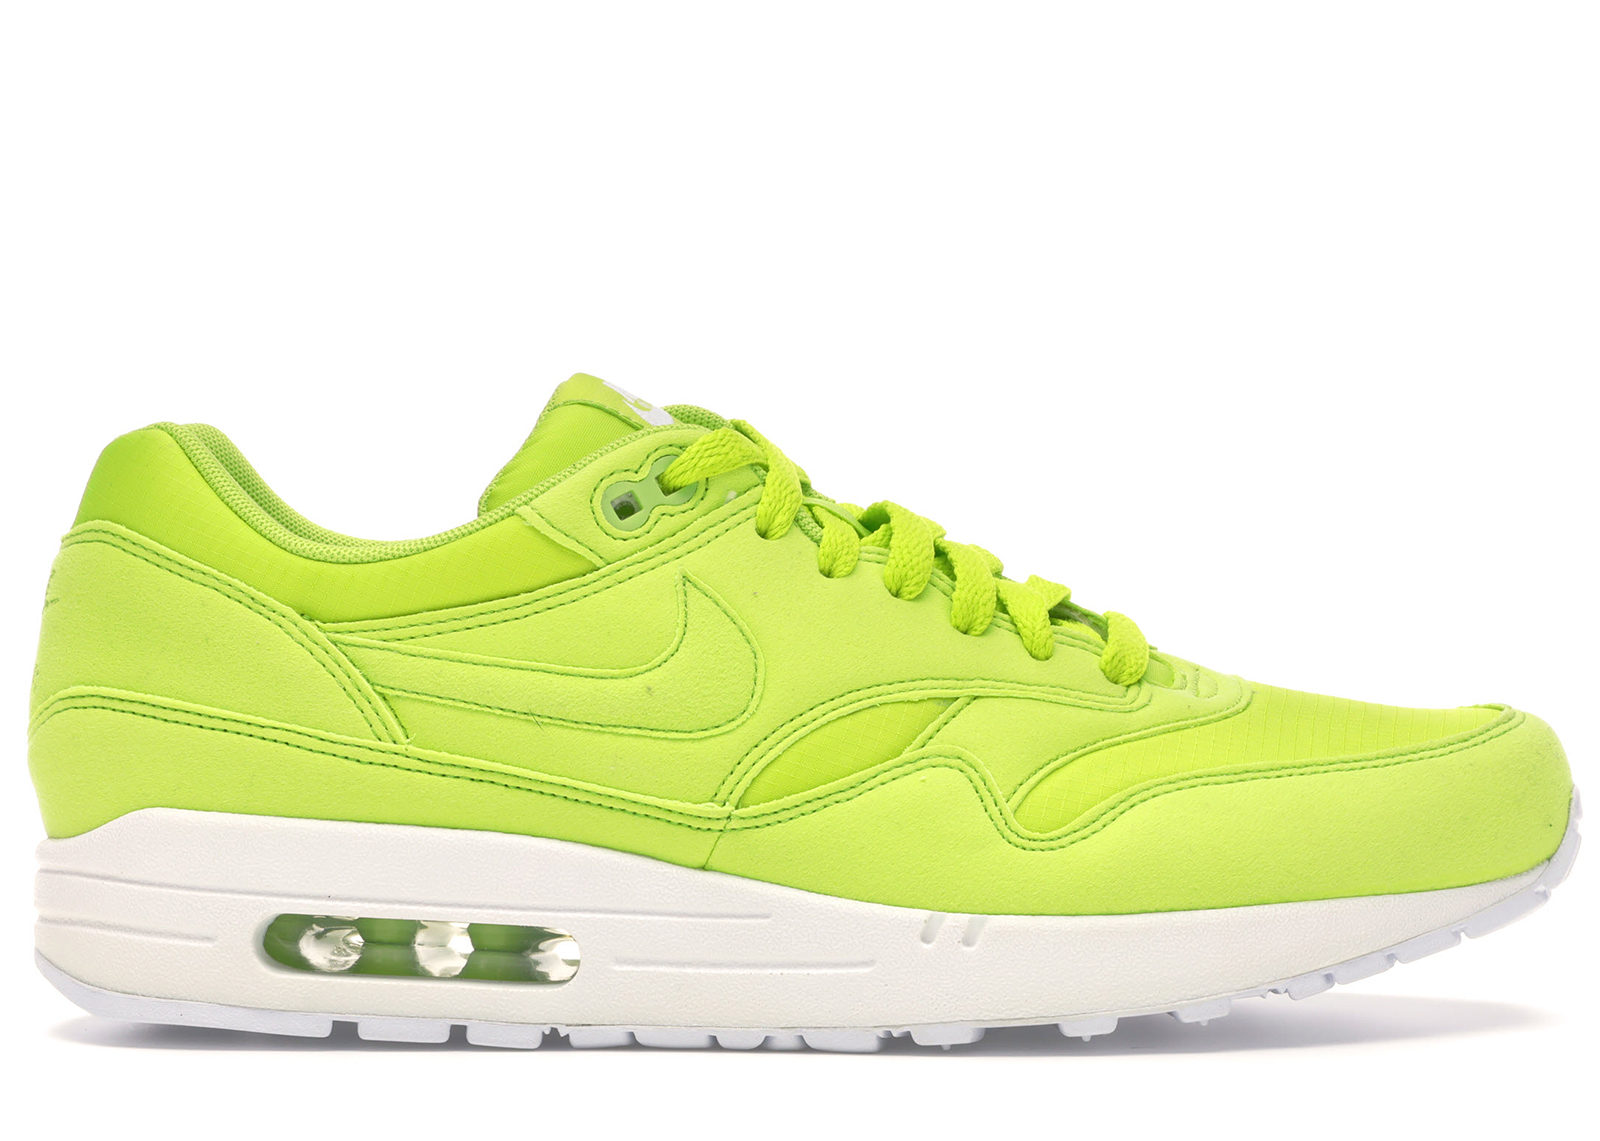 Nike Air Max 1 Ripstop Pack Green